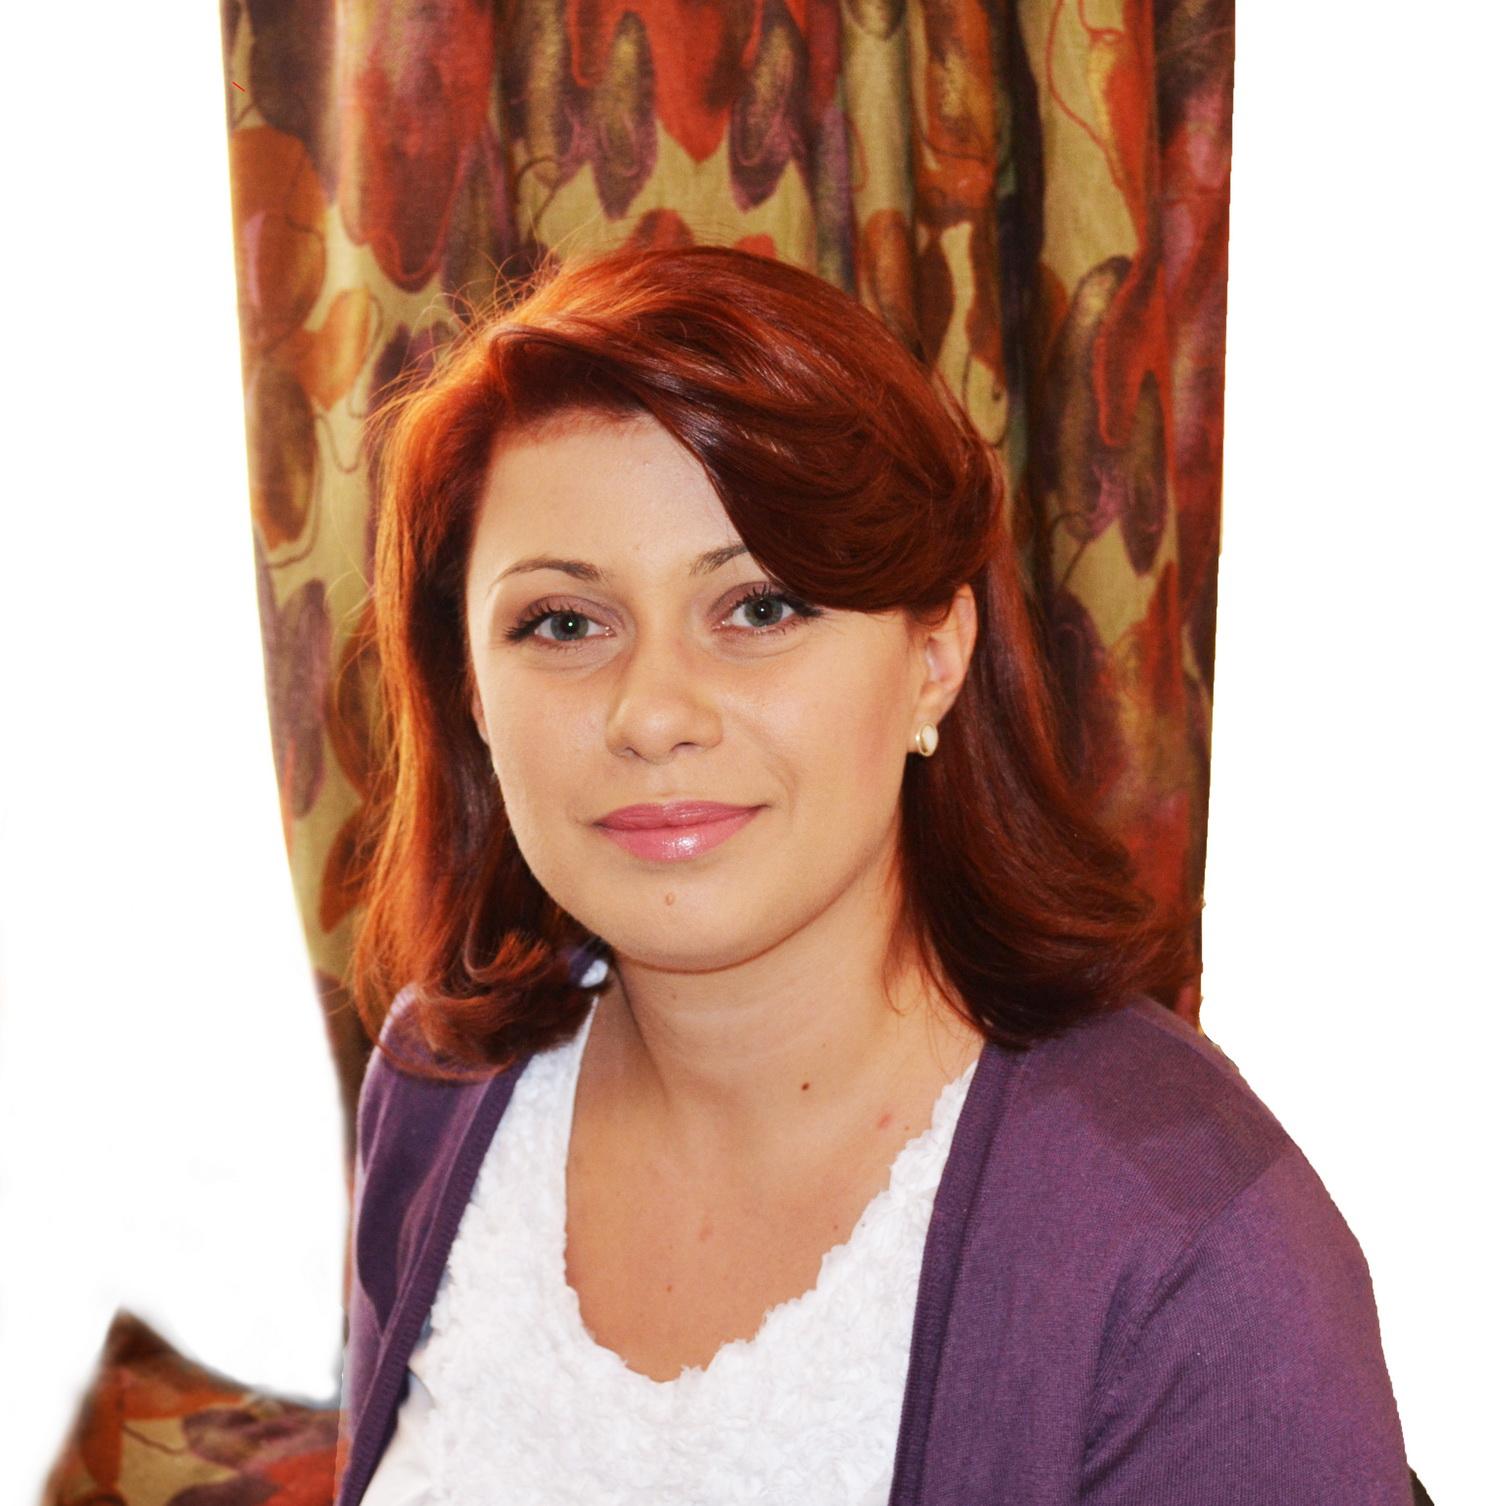 Cunoaste-l pe designerul nostru: Marinela Nita